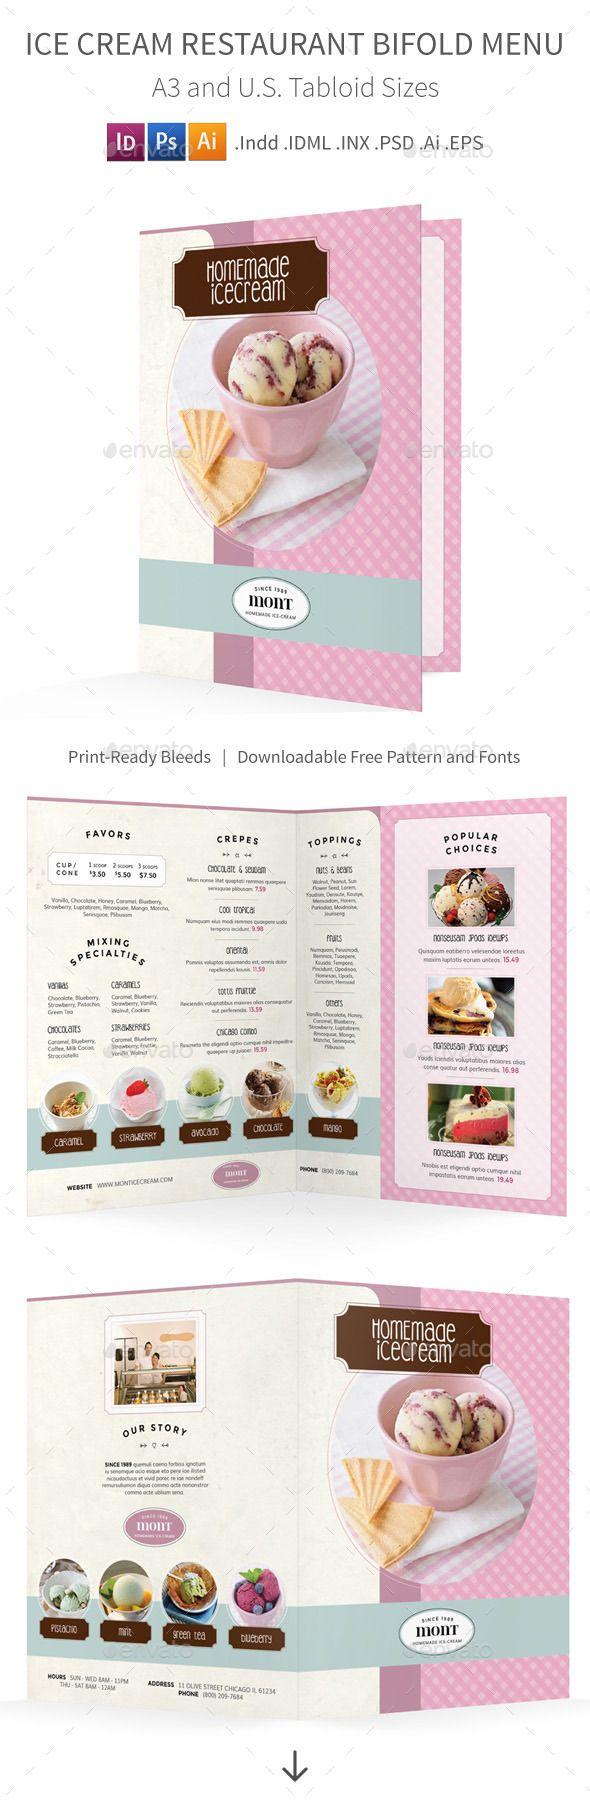 Ice Cream Restaurant Bifold / Halffold Menu Template #design #alimentationmenu Download: http://graphicriver.net/item/ice-cream-restaurant-bifold-halffold-menu/12257881?ref=ksioks